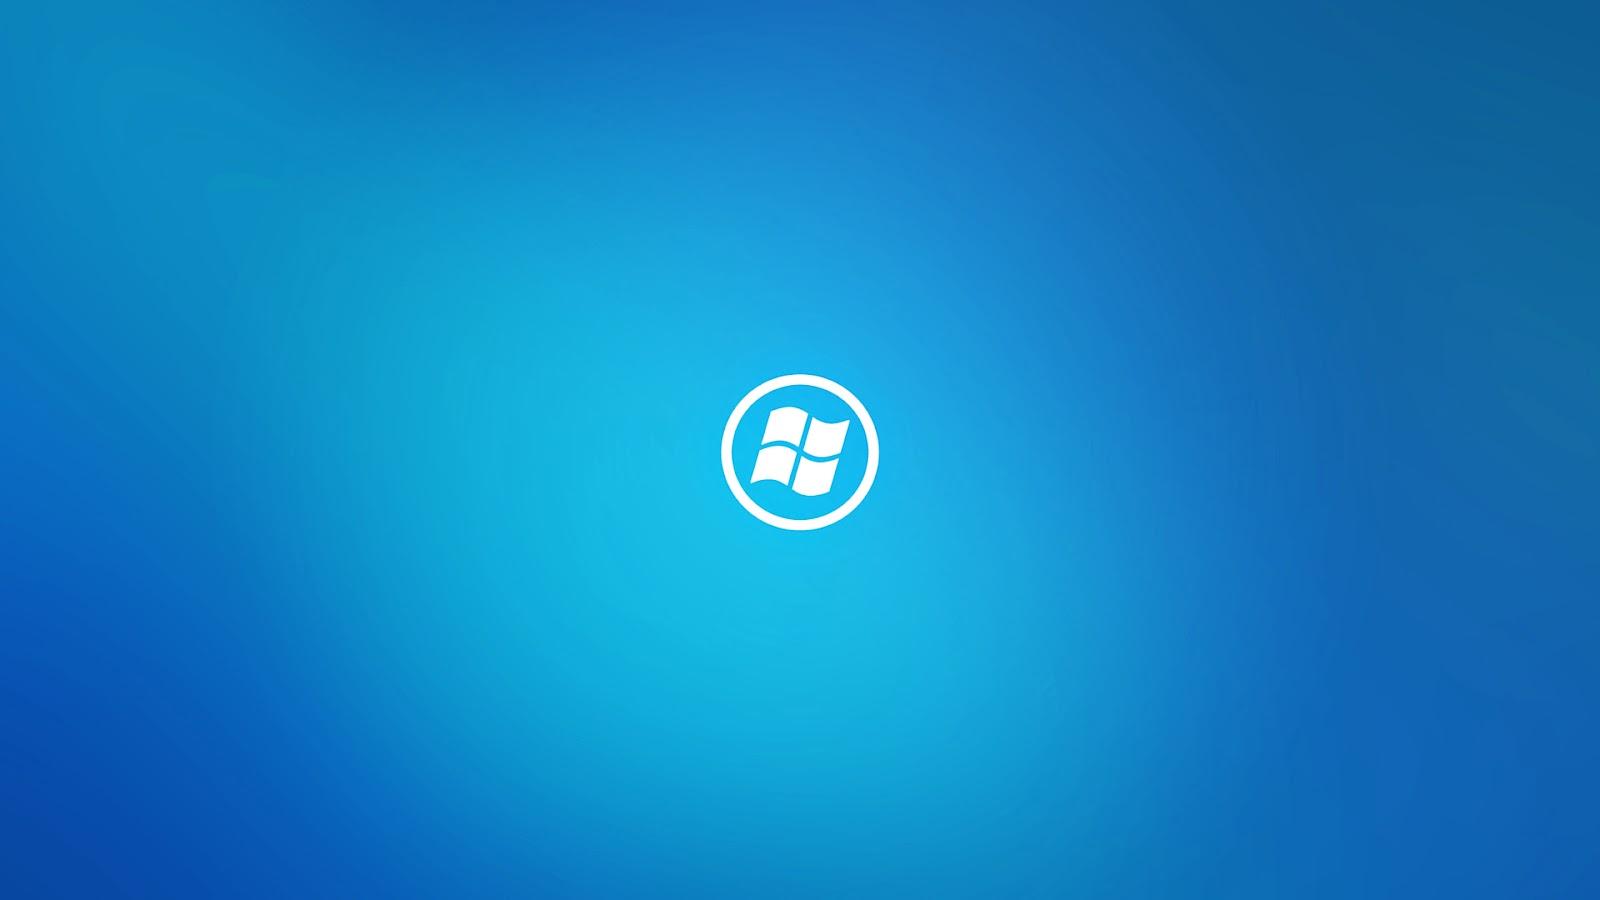 Windows 10 Earth Wallpapers HD - WallpaperSafari